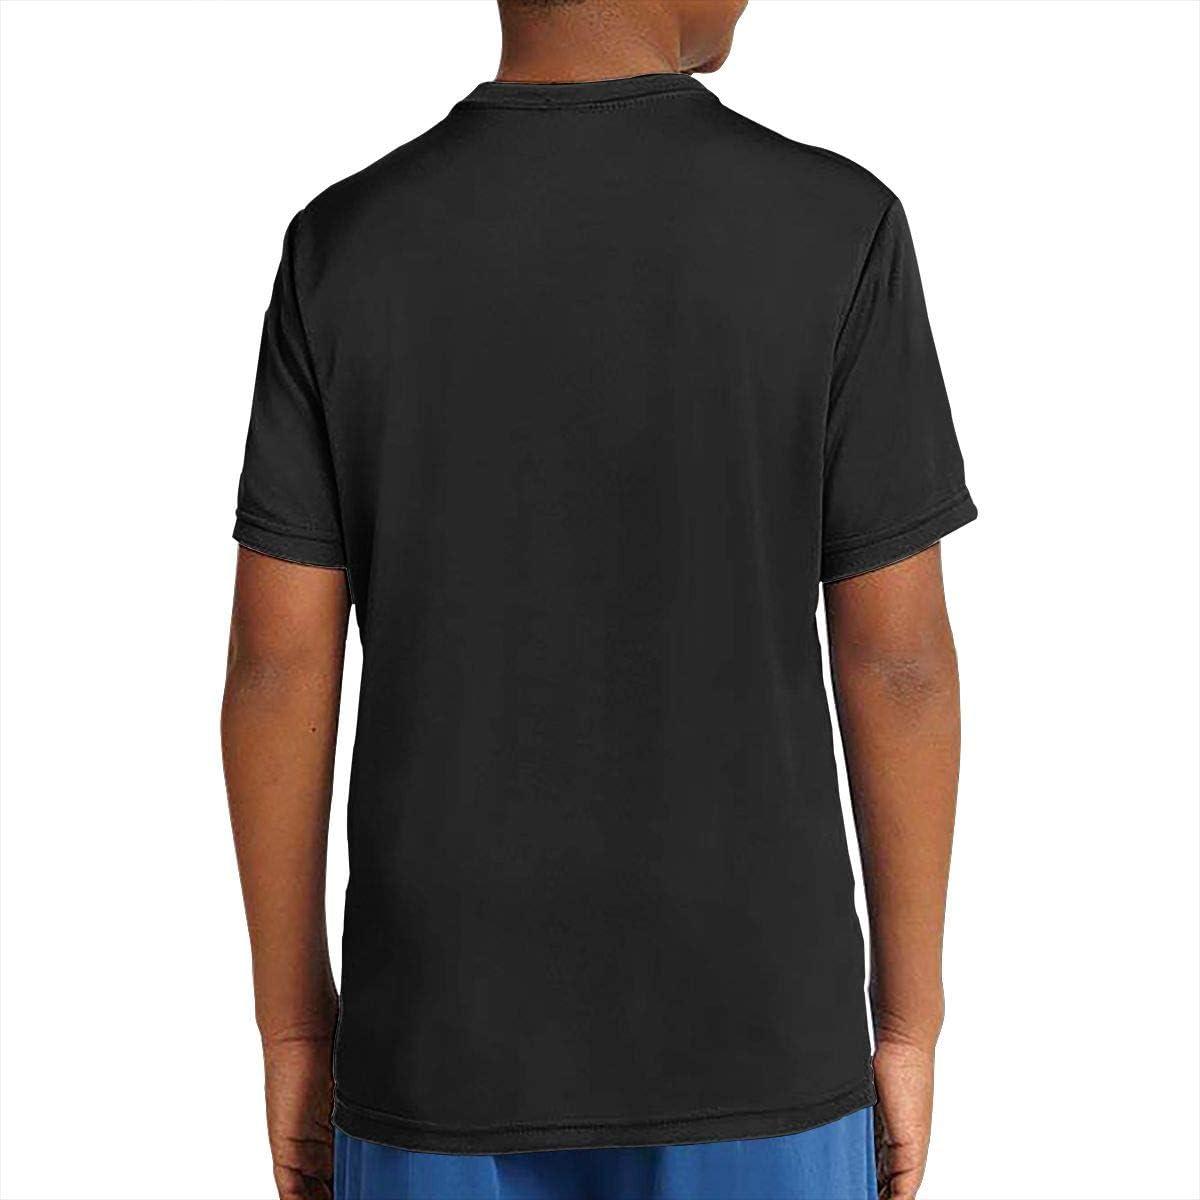 BETHANYJONES Teenager Boys Girls Short Sleeve Tee Youth Tshirt Fashion Black Clothing